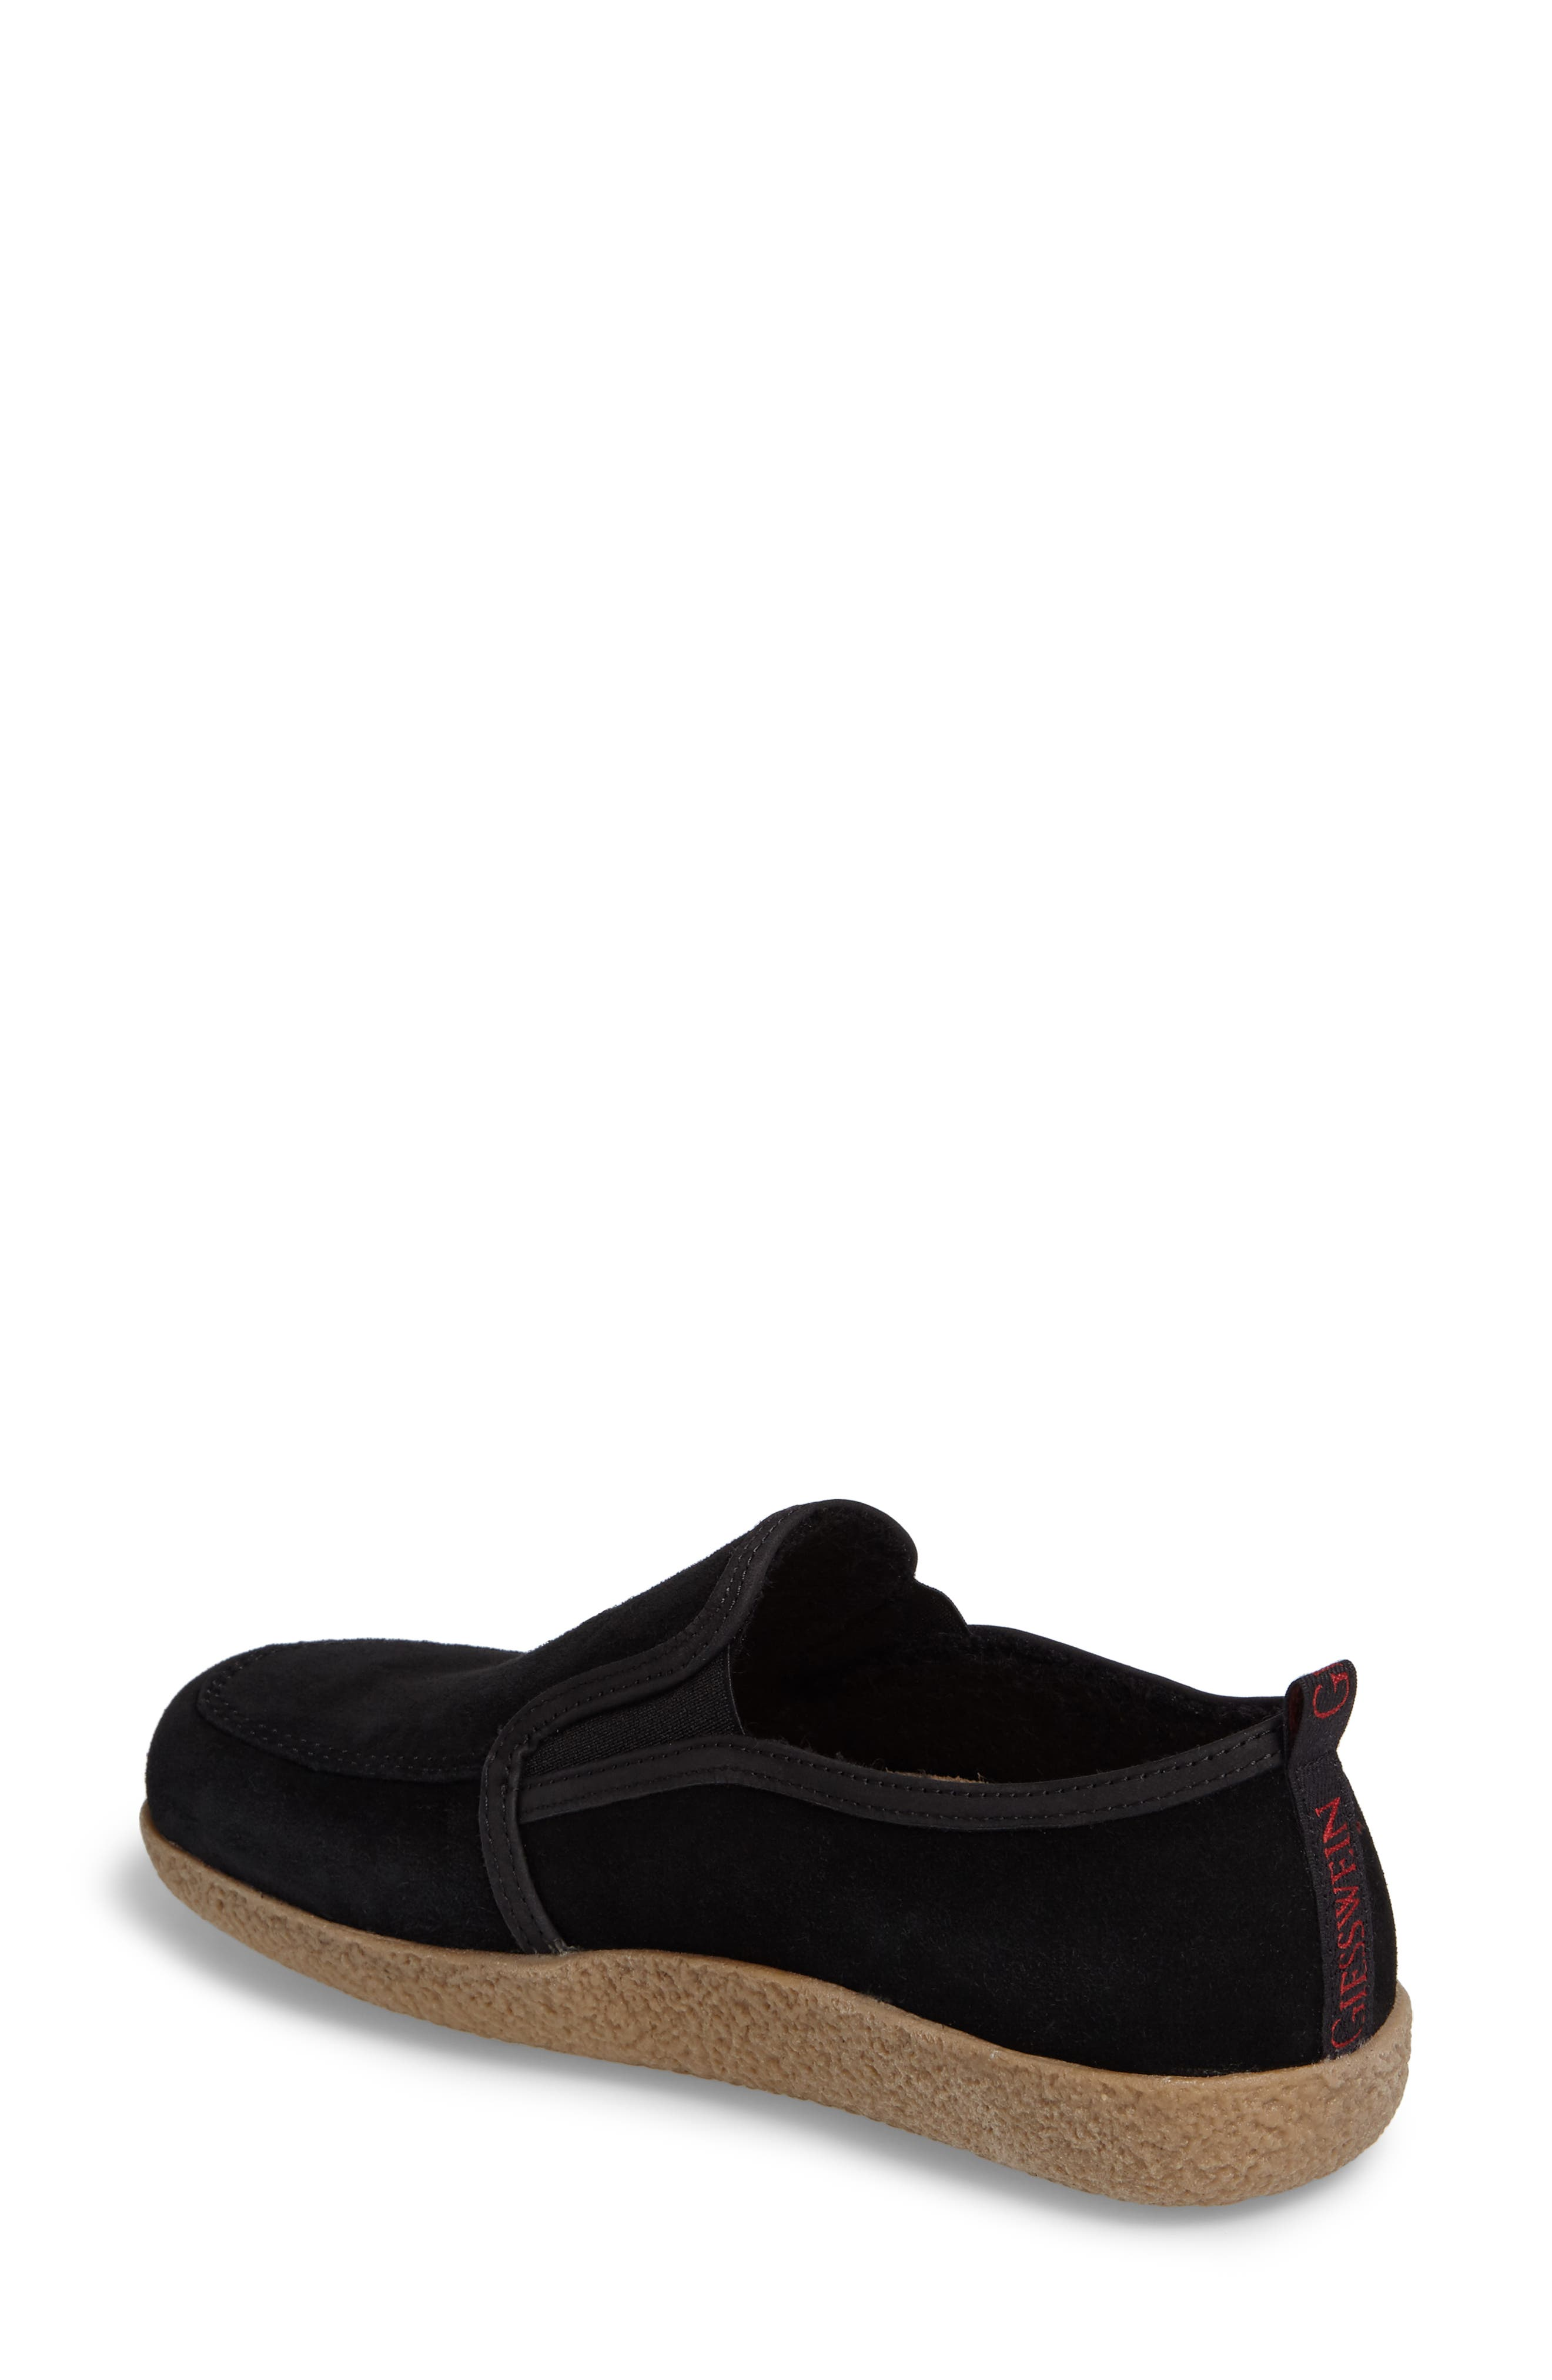 Alpen Loafer,                             Alternate thumbnail 2, color,                             Black Wool